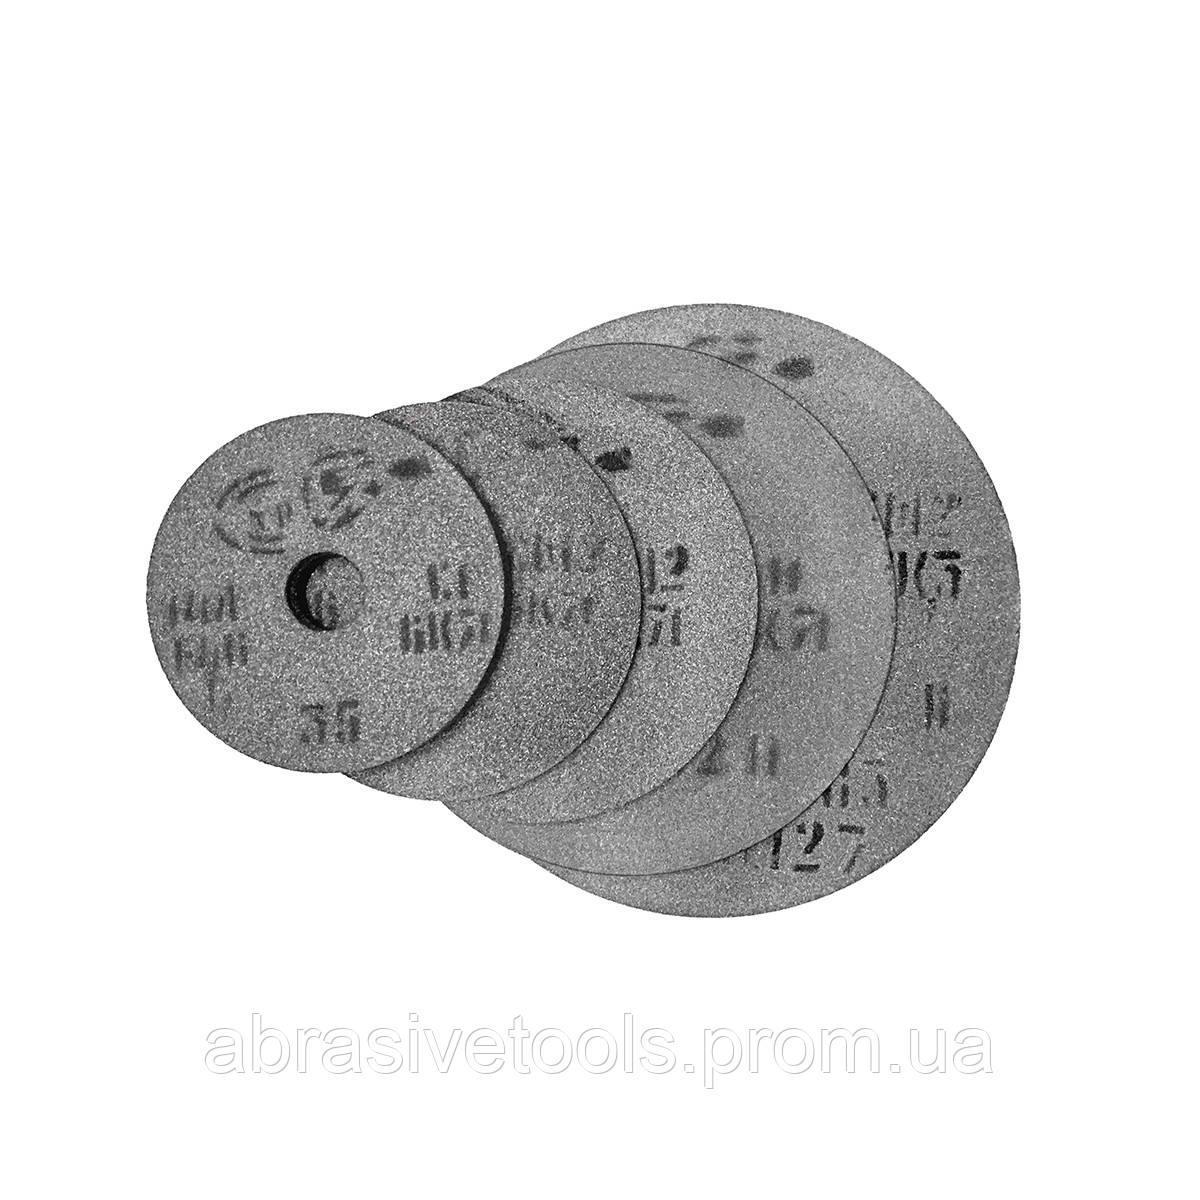 Круг шлифовальный 250х25х76  F46 СМ2